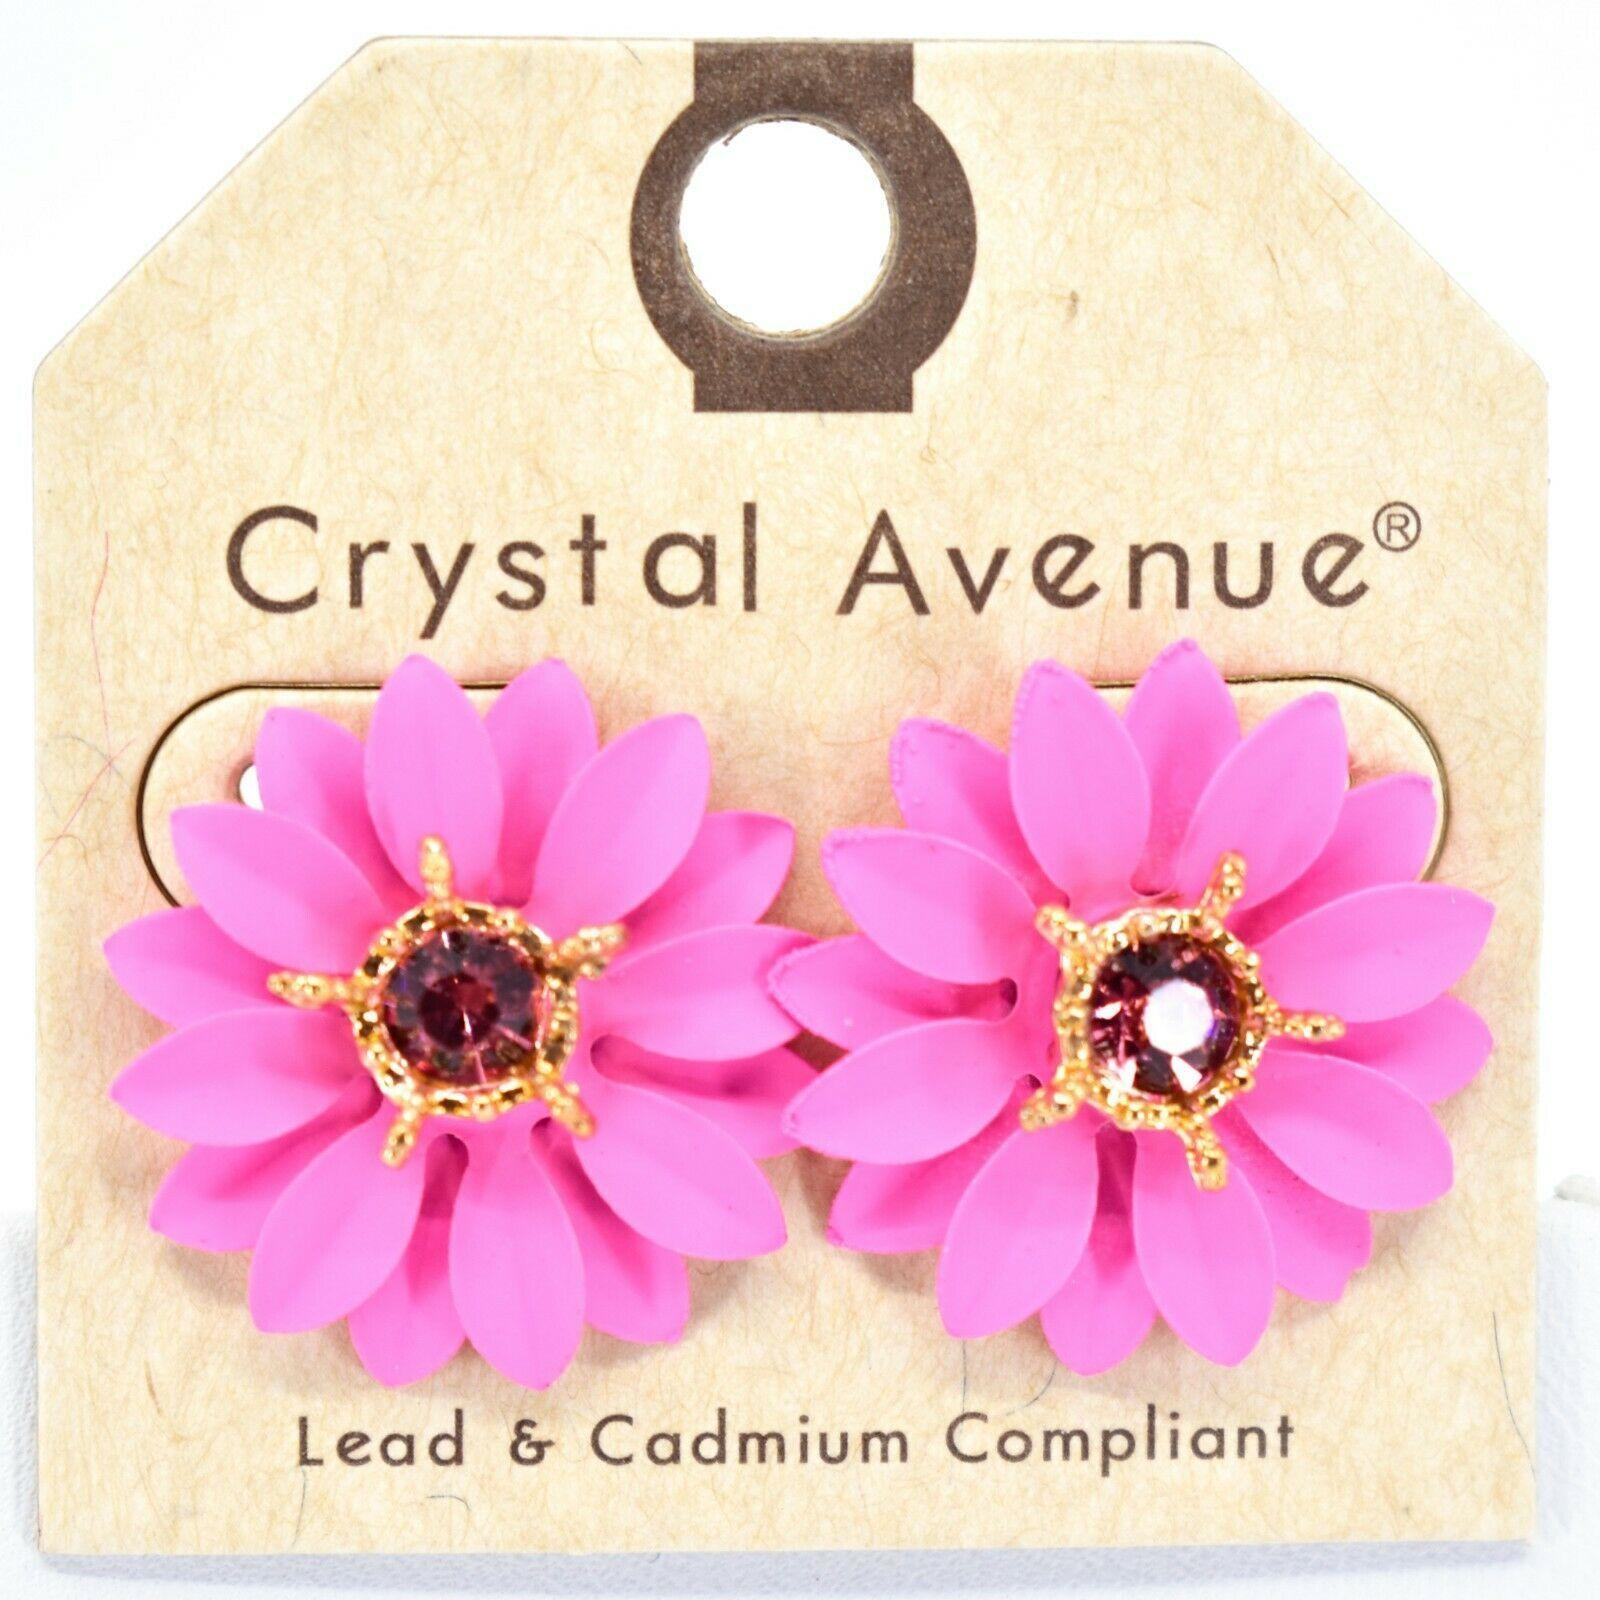 Crystal Avenue Hot Pink Colorful Layered Petal Spring Flower Metal Post Earrings